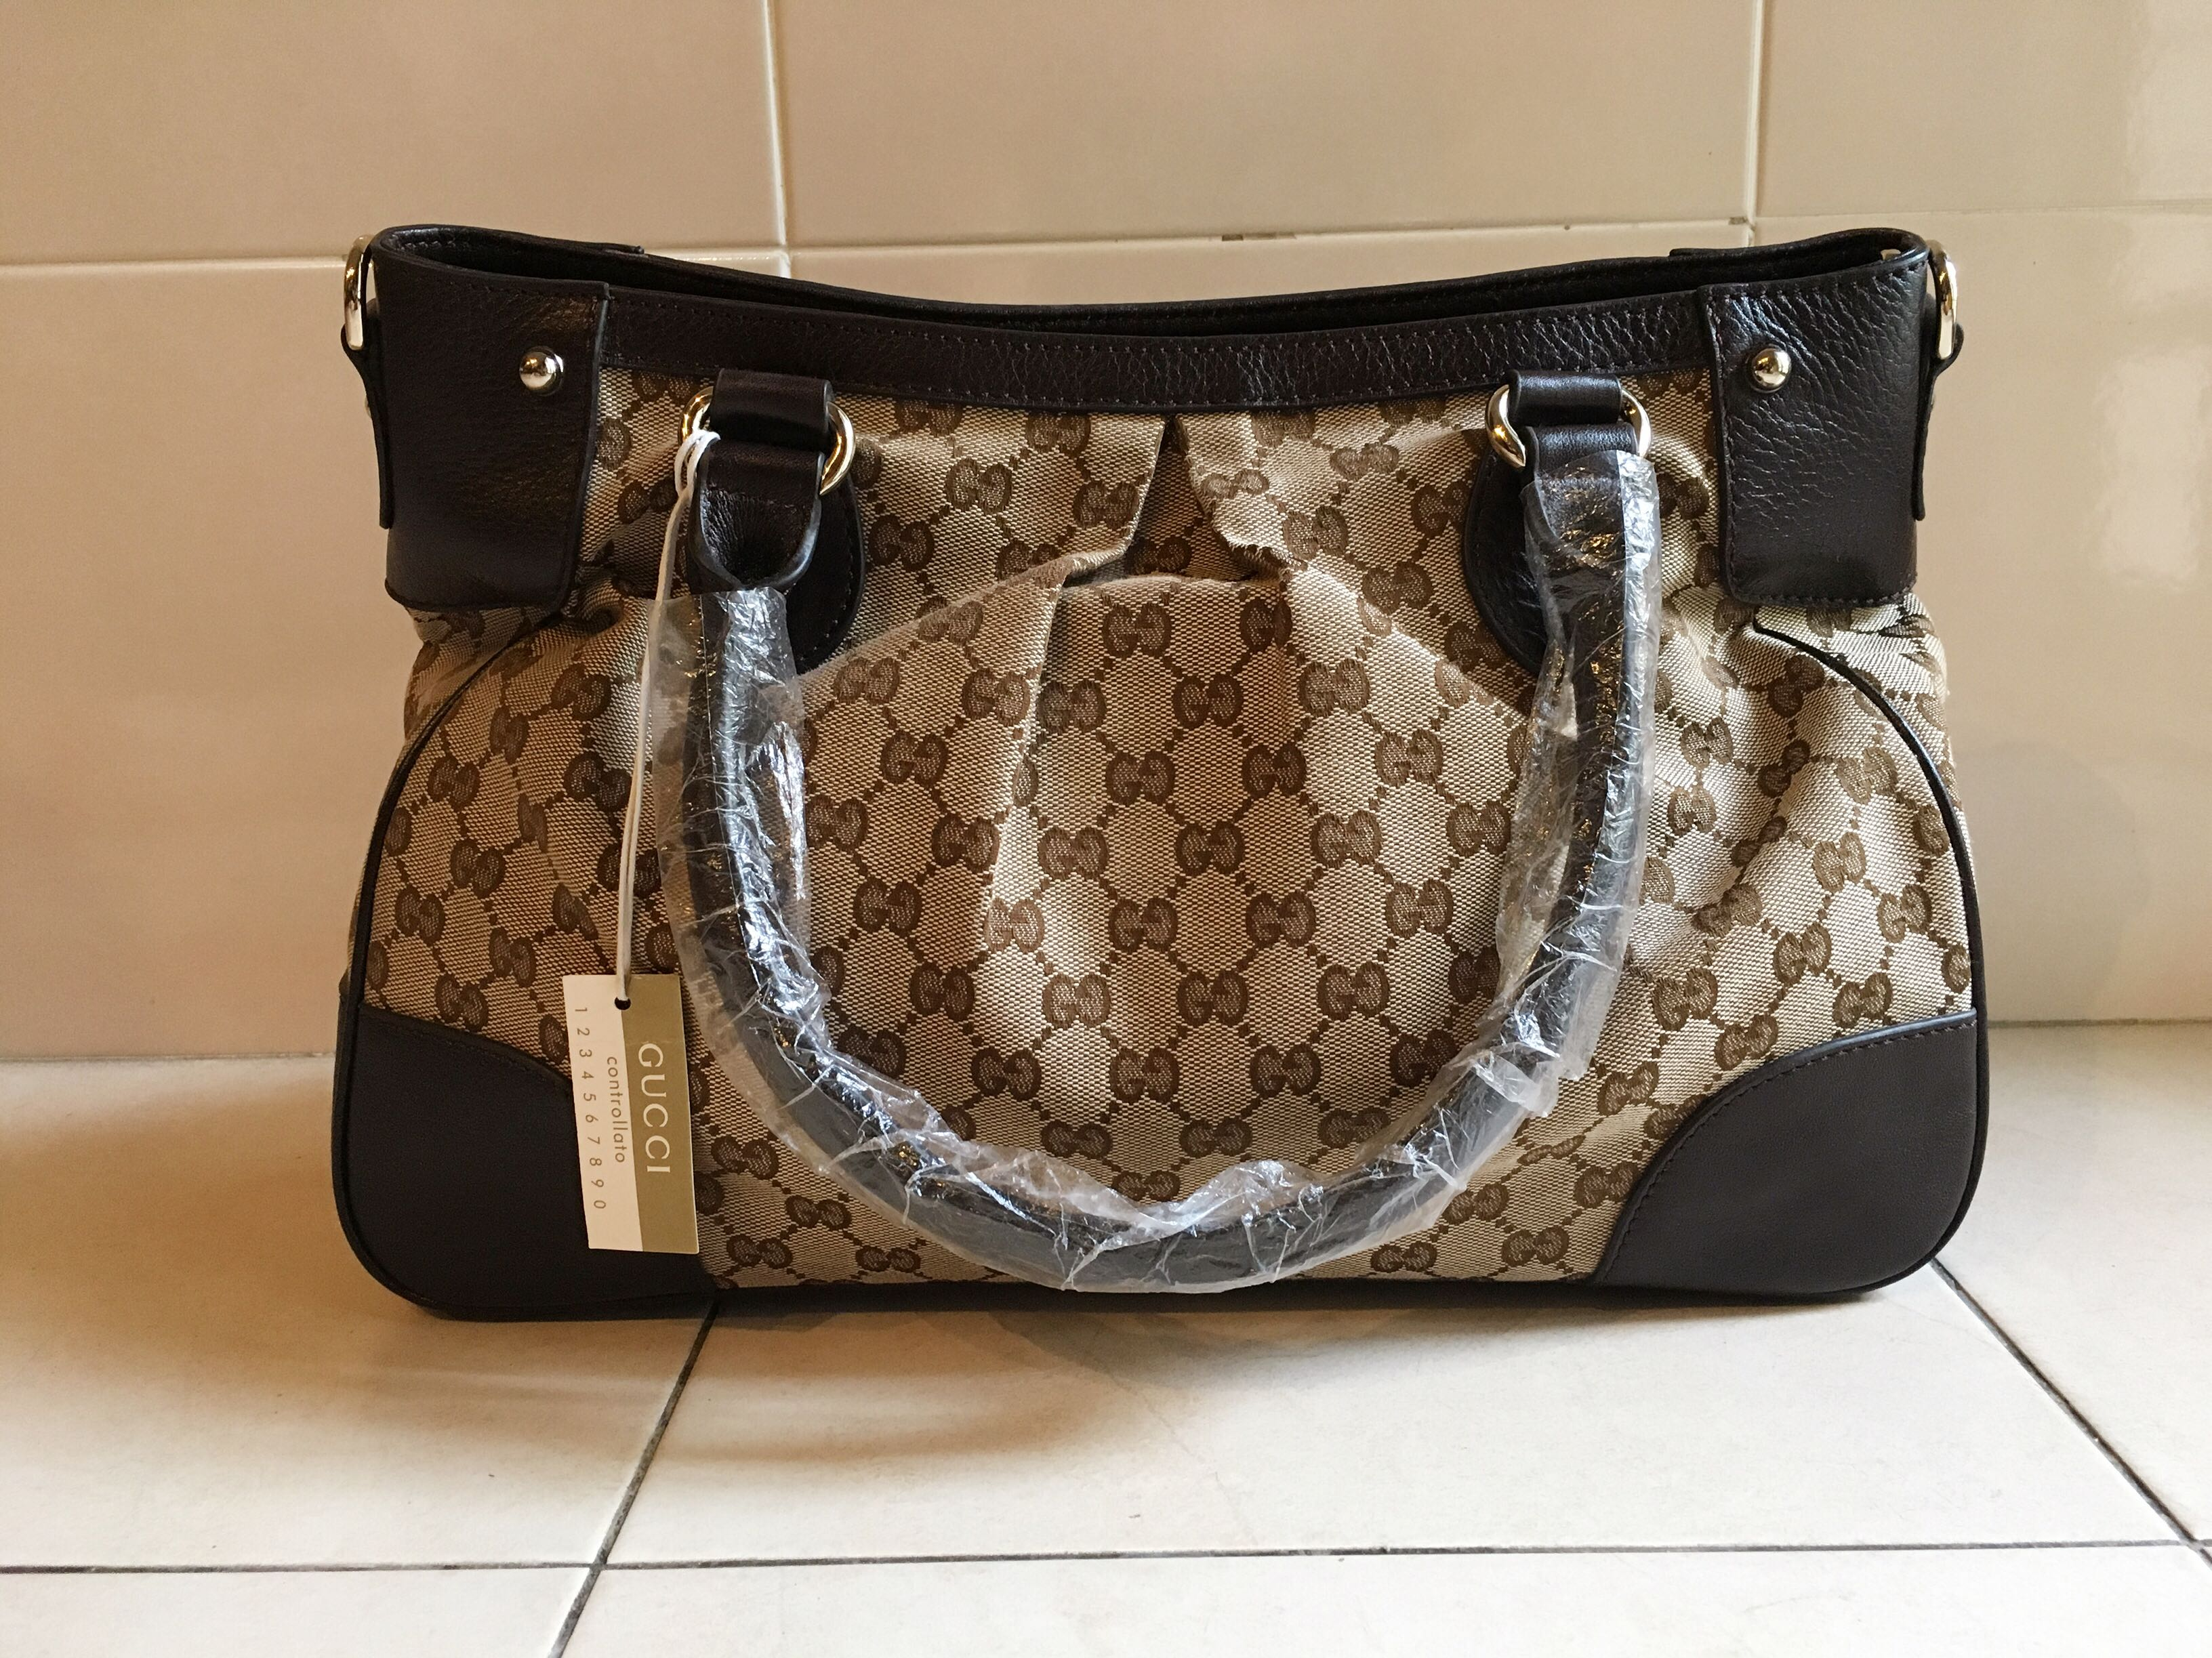 674728ece Gucci Monogram Canvas Tote Bag, Women's Fashion, Bags & Wallets on ...